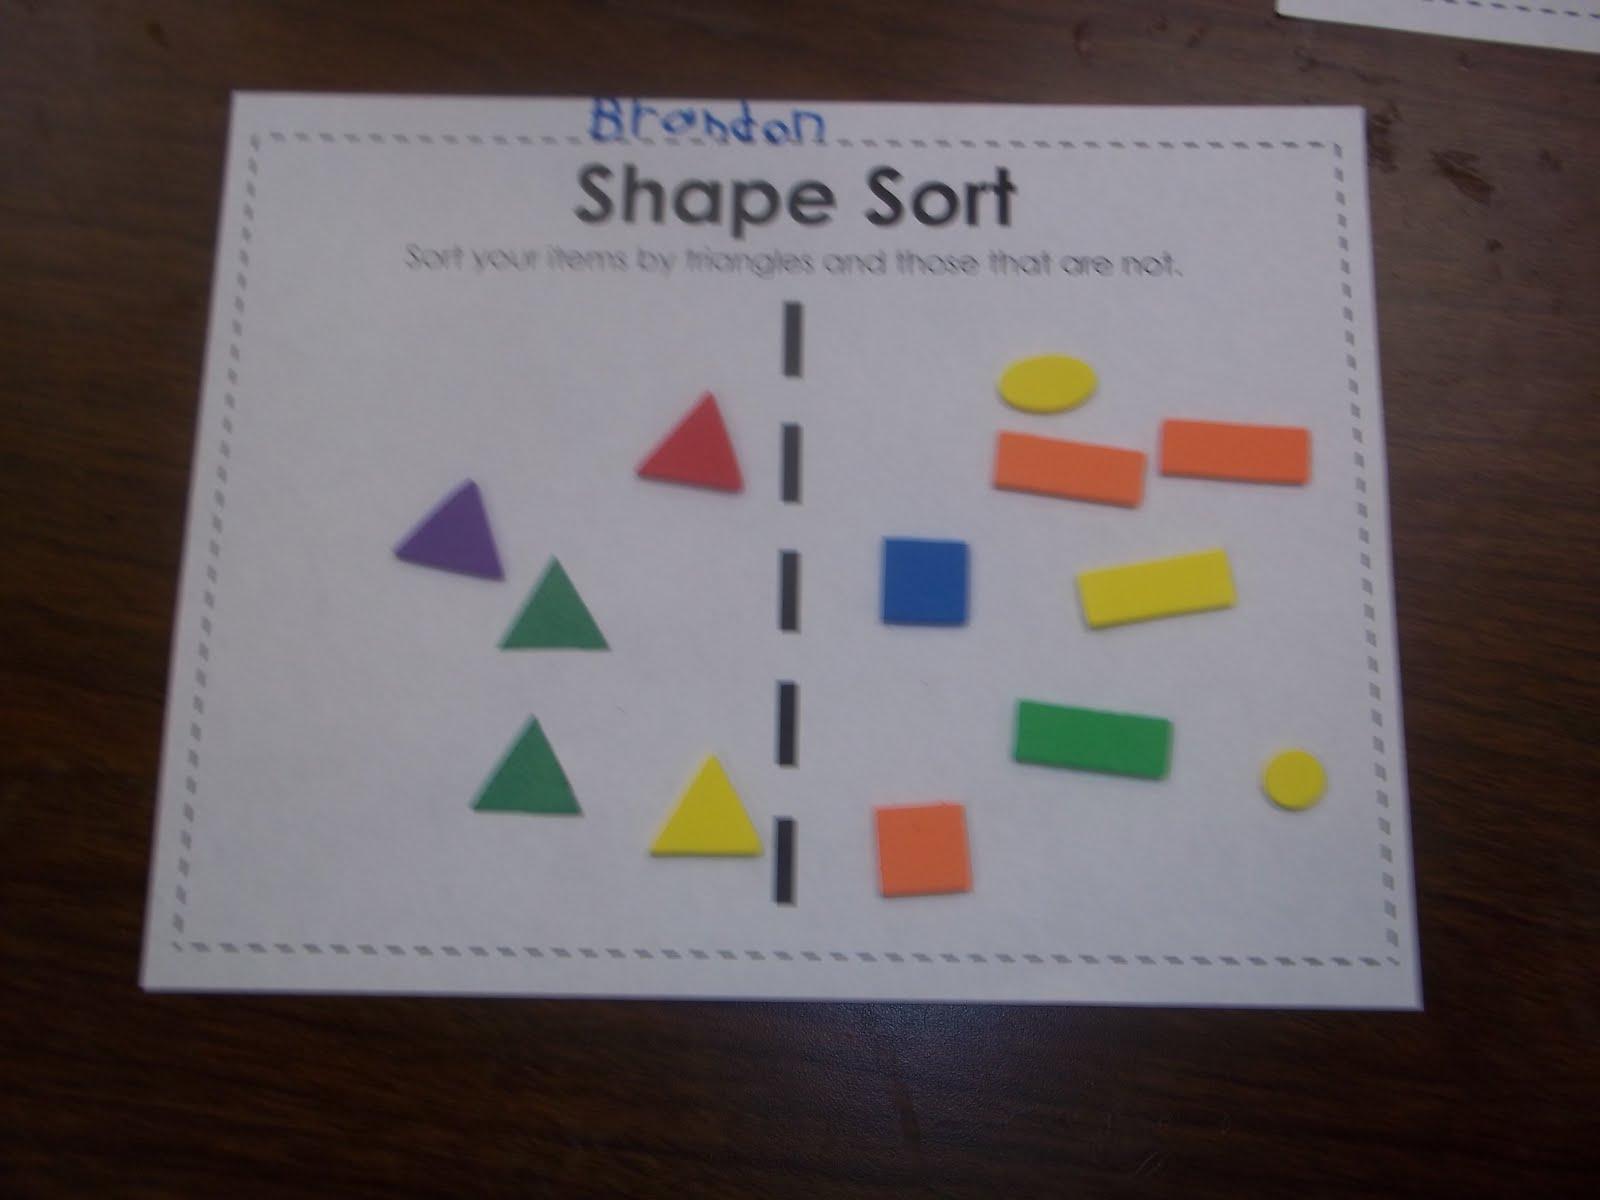 Kinder Garden: Mrs. Wood's Kindergarten Class: Shapes